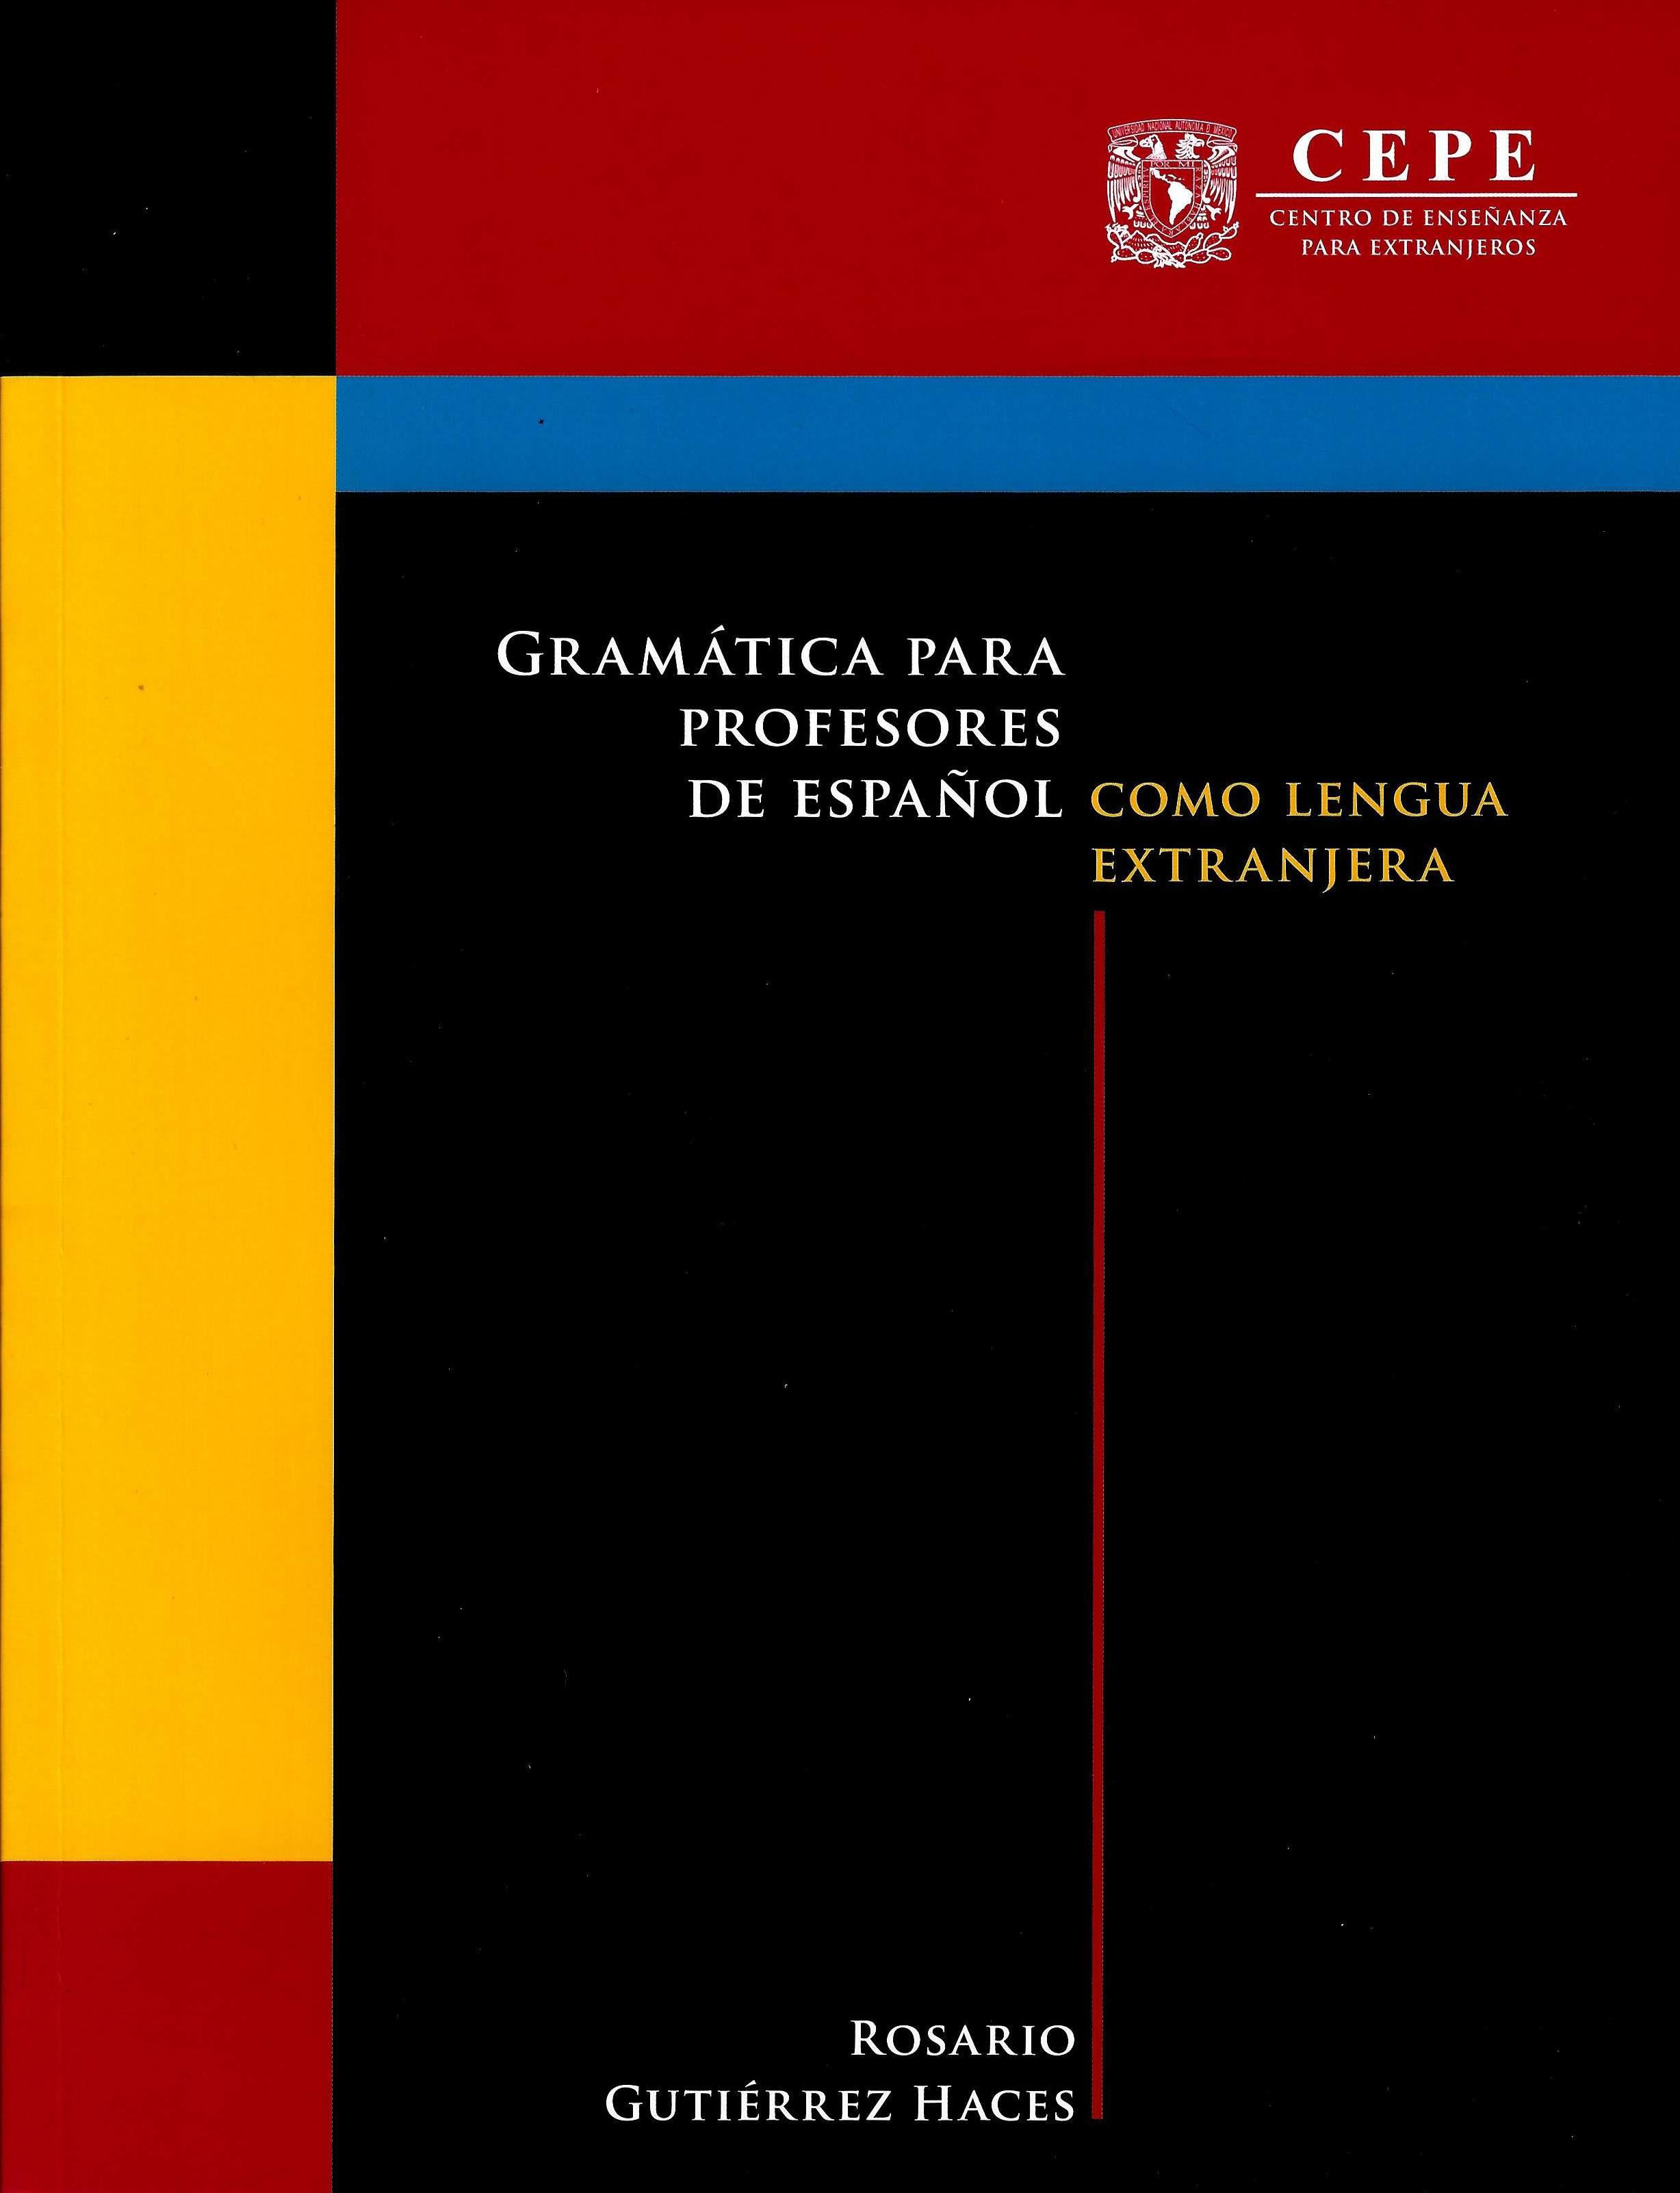 Gramática para profesores de español como lengua extranjera